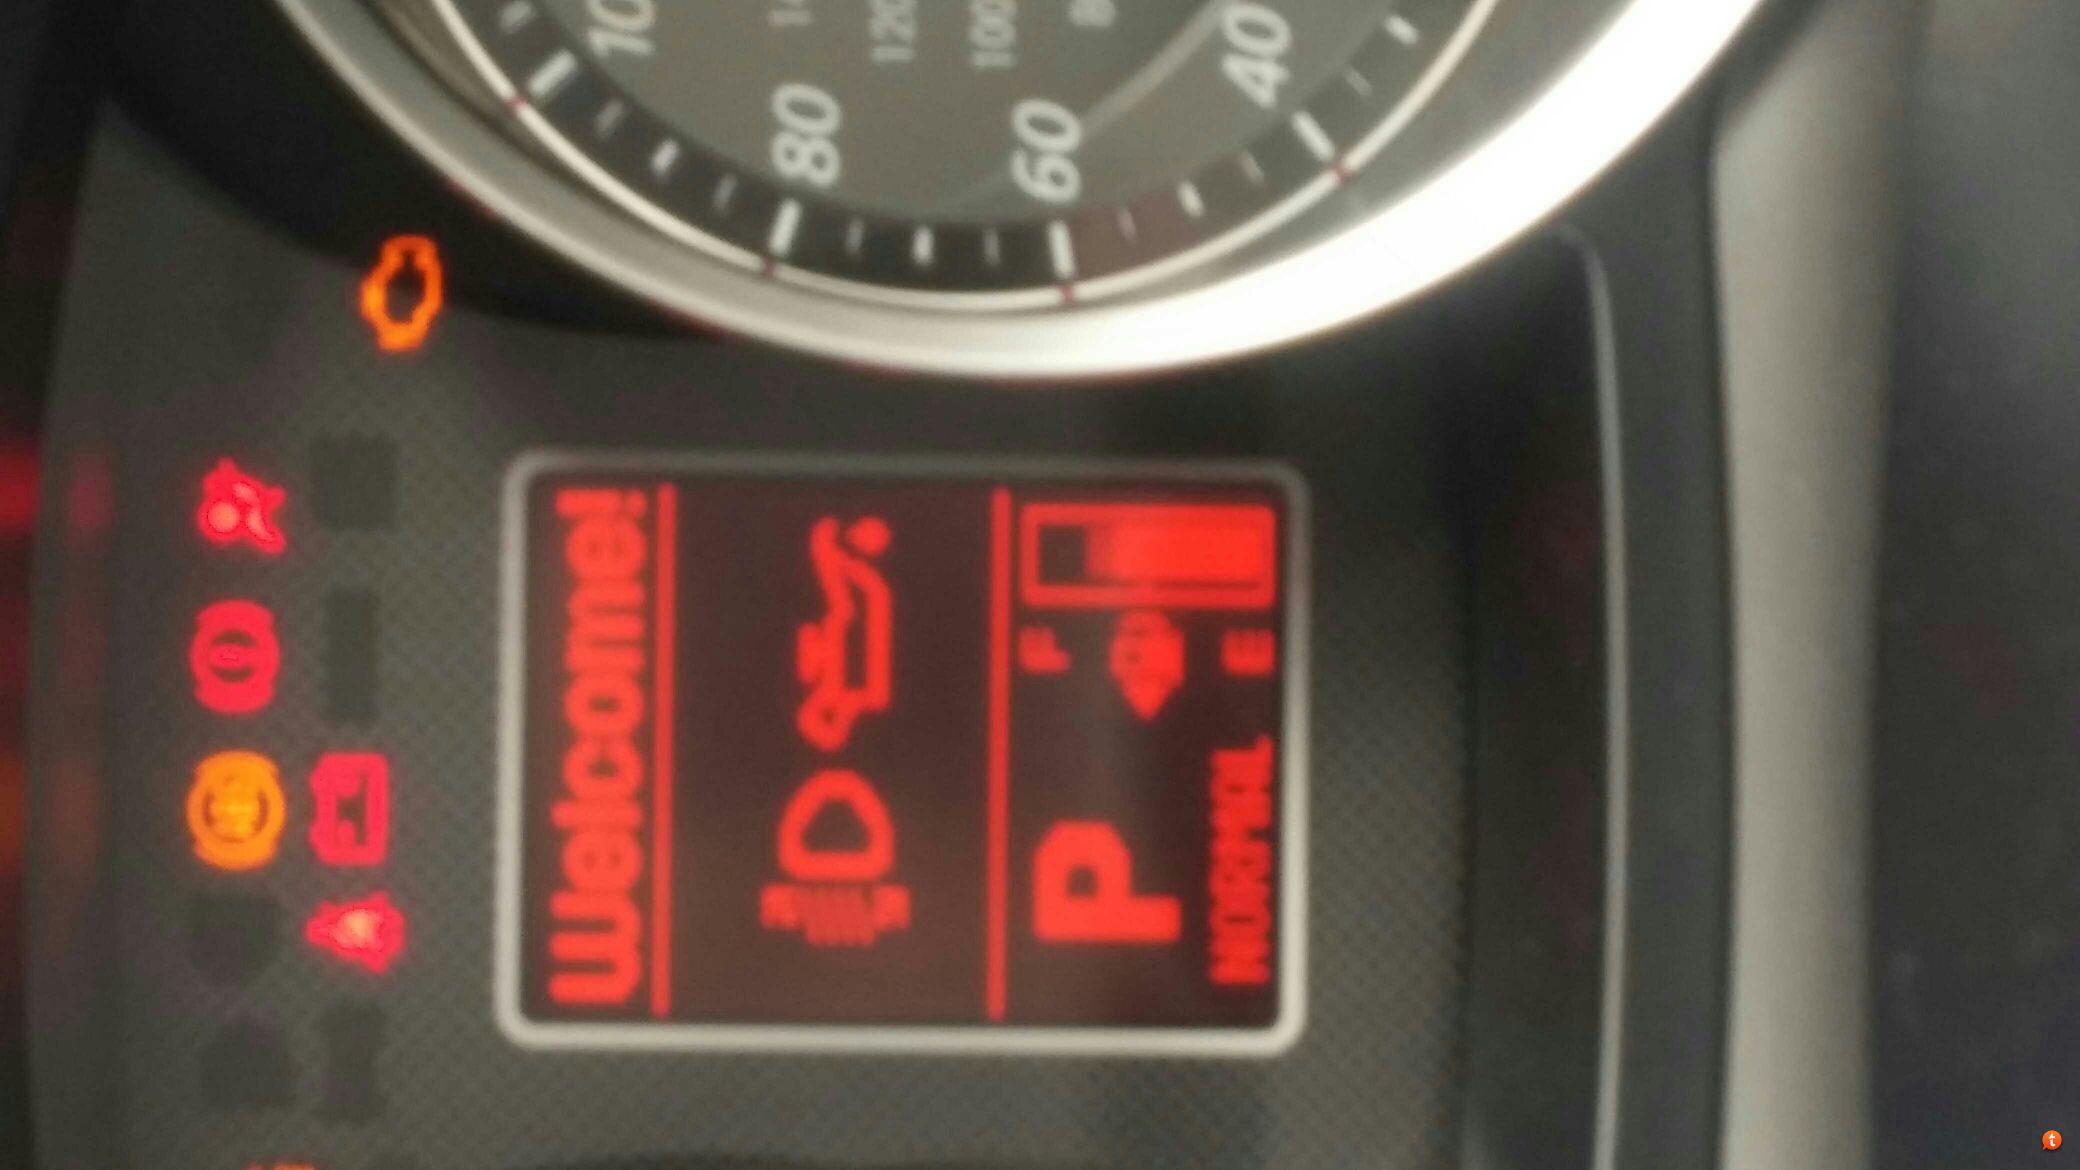 Mitsubishi fuso warning light symbols image collections symbol mitsubishi fuso warning light symbols choice image symbol and lancer mitsubishi warning light symbols view symbol buycottarizona